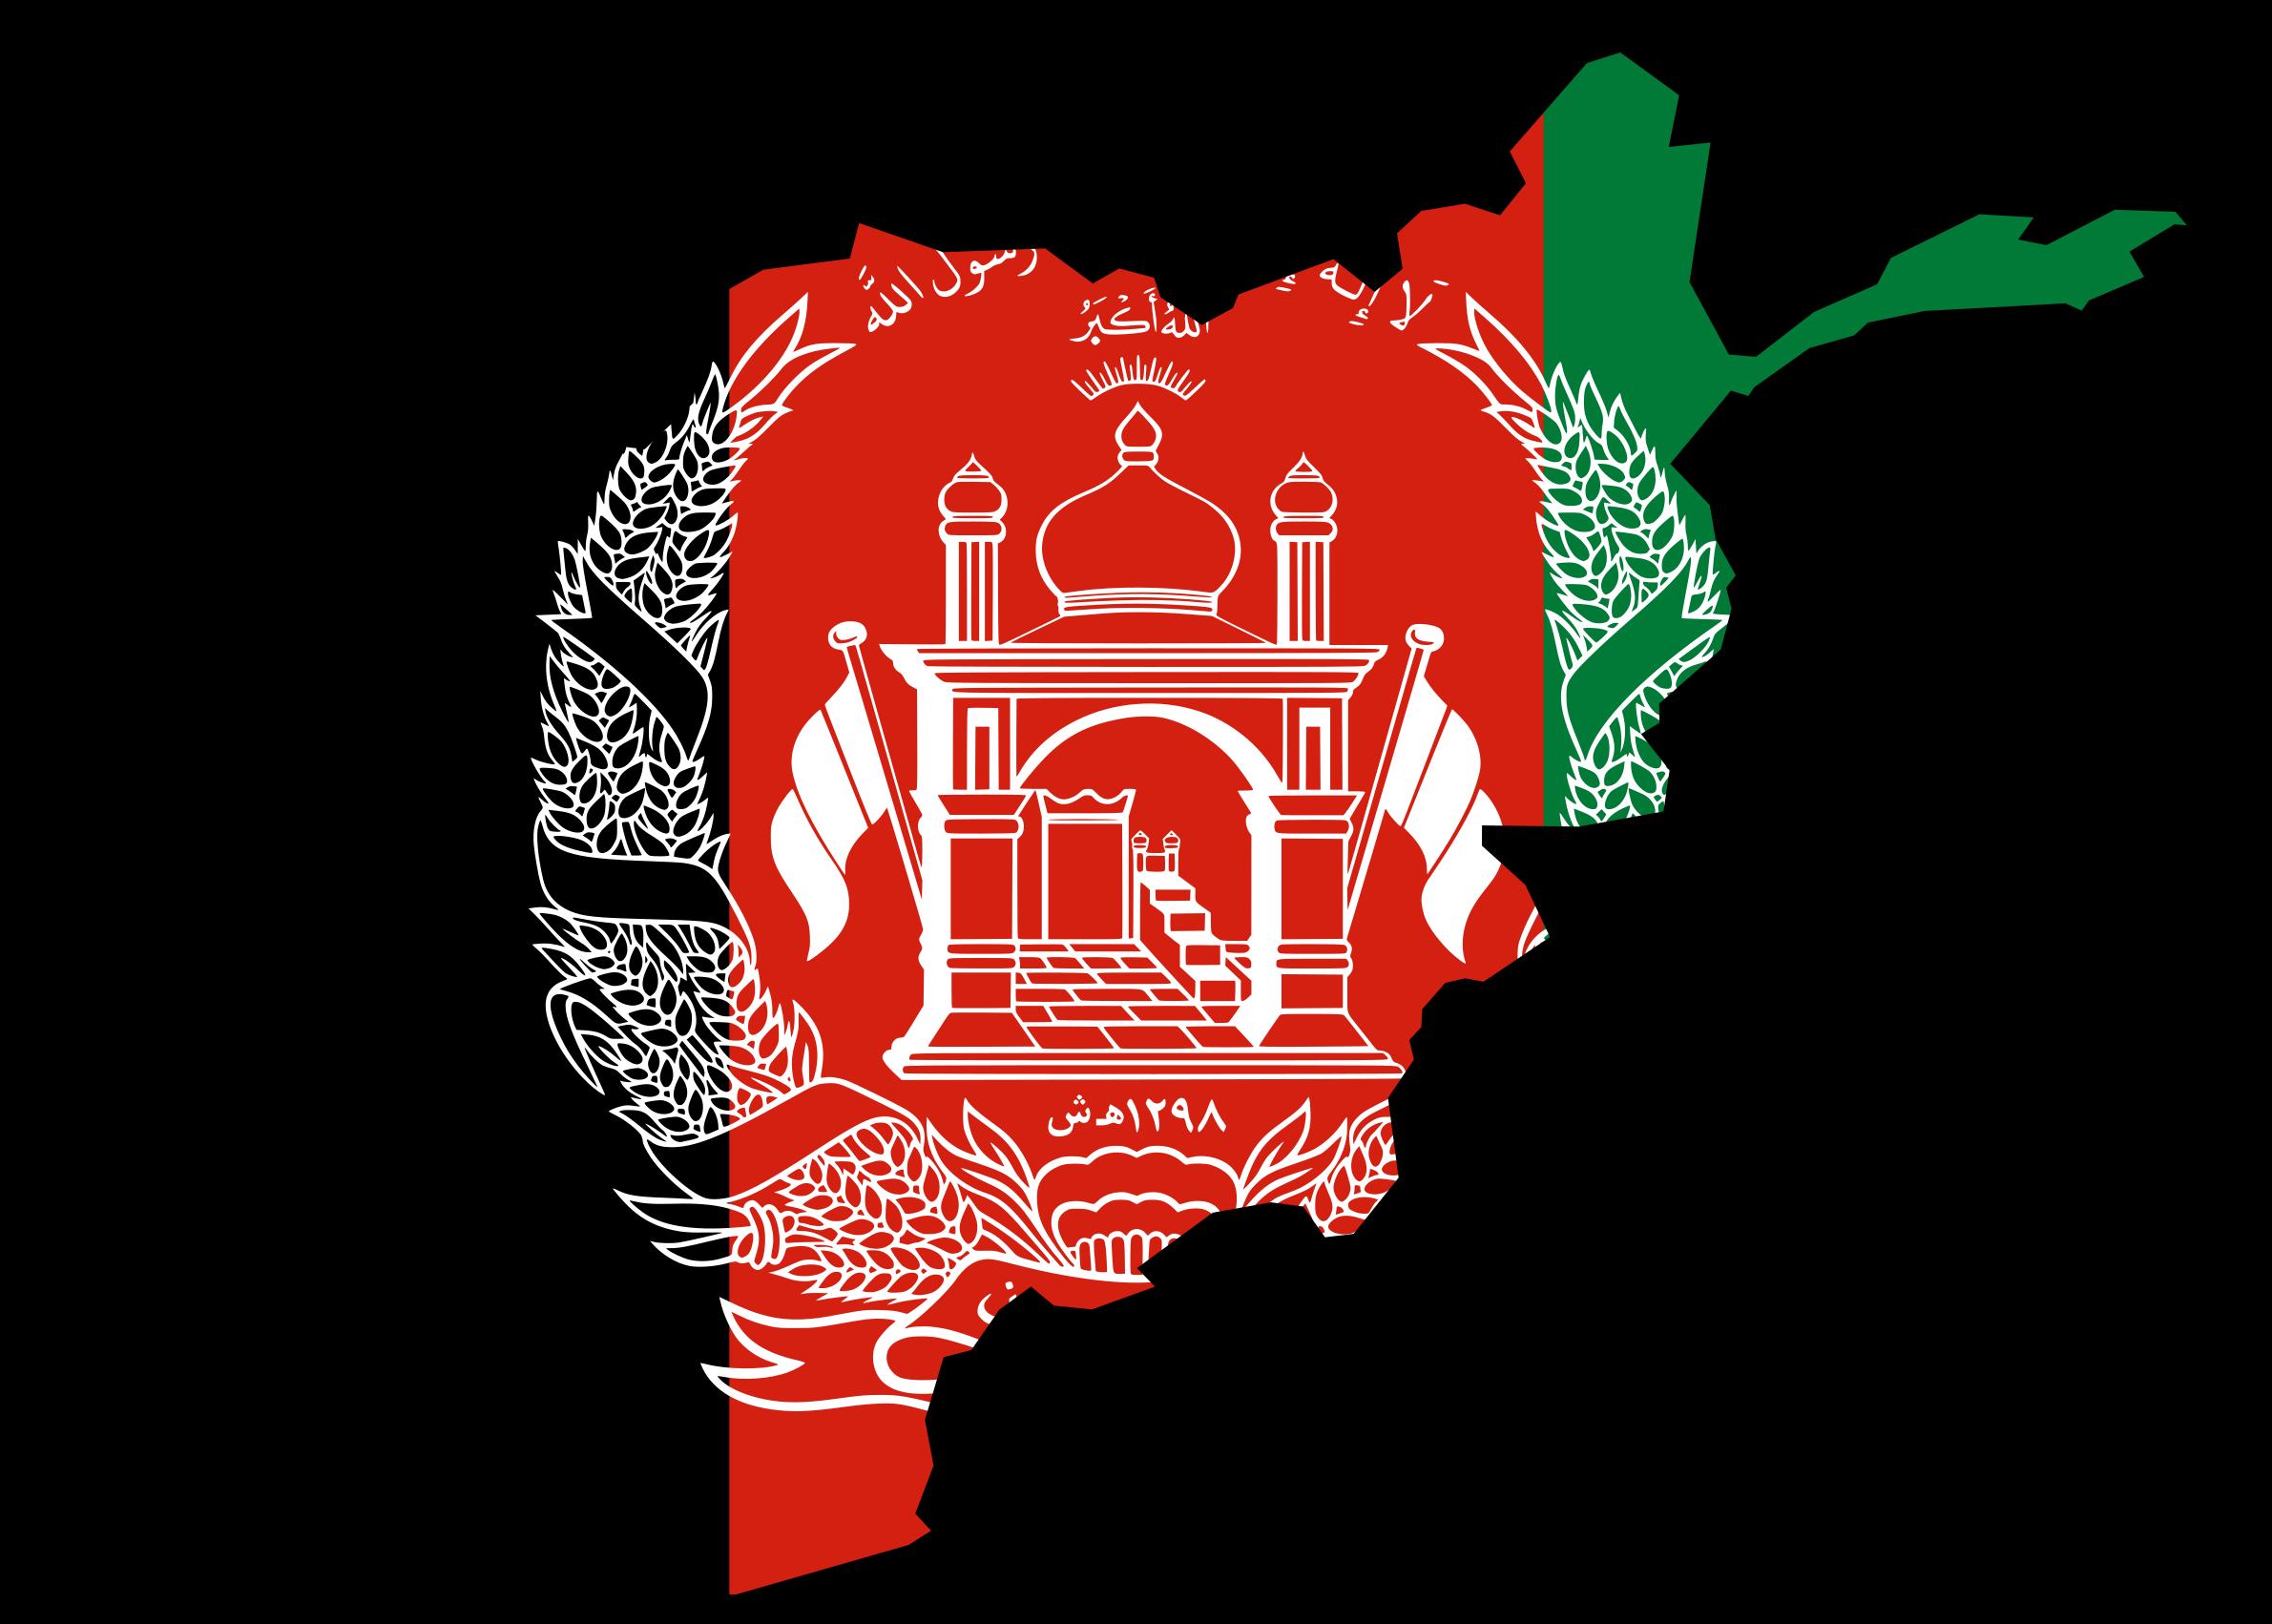 مرتبط با حوادث افغانستان